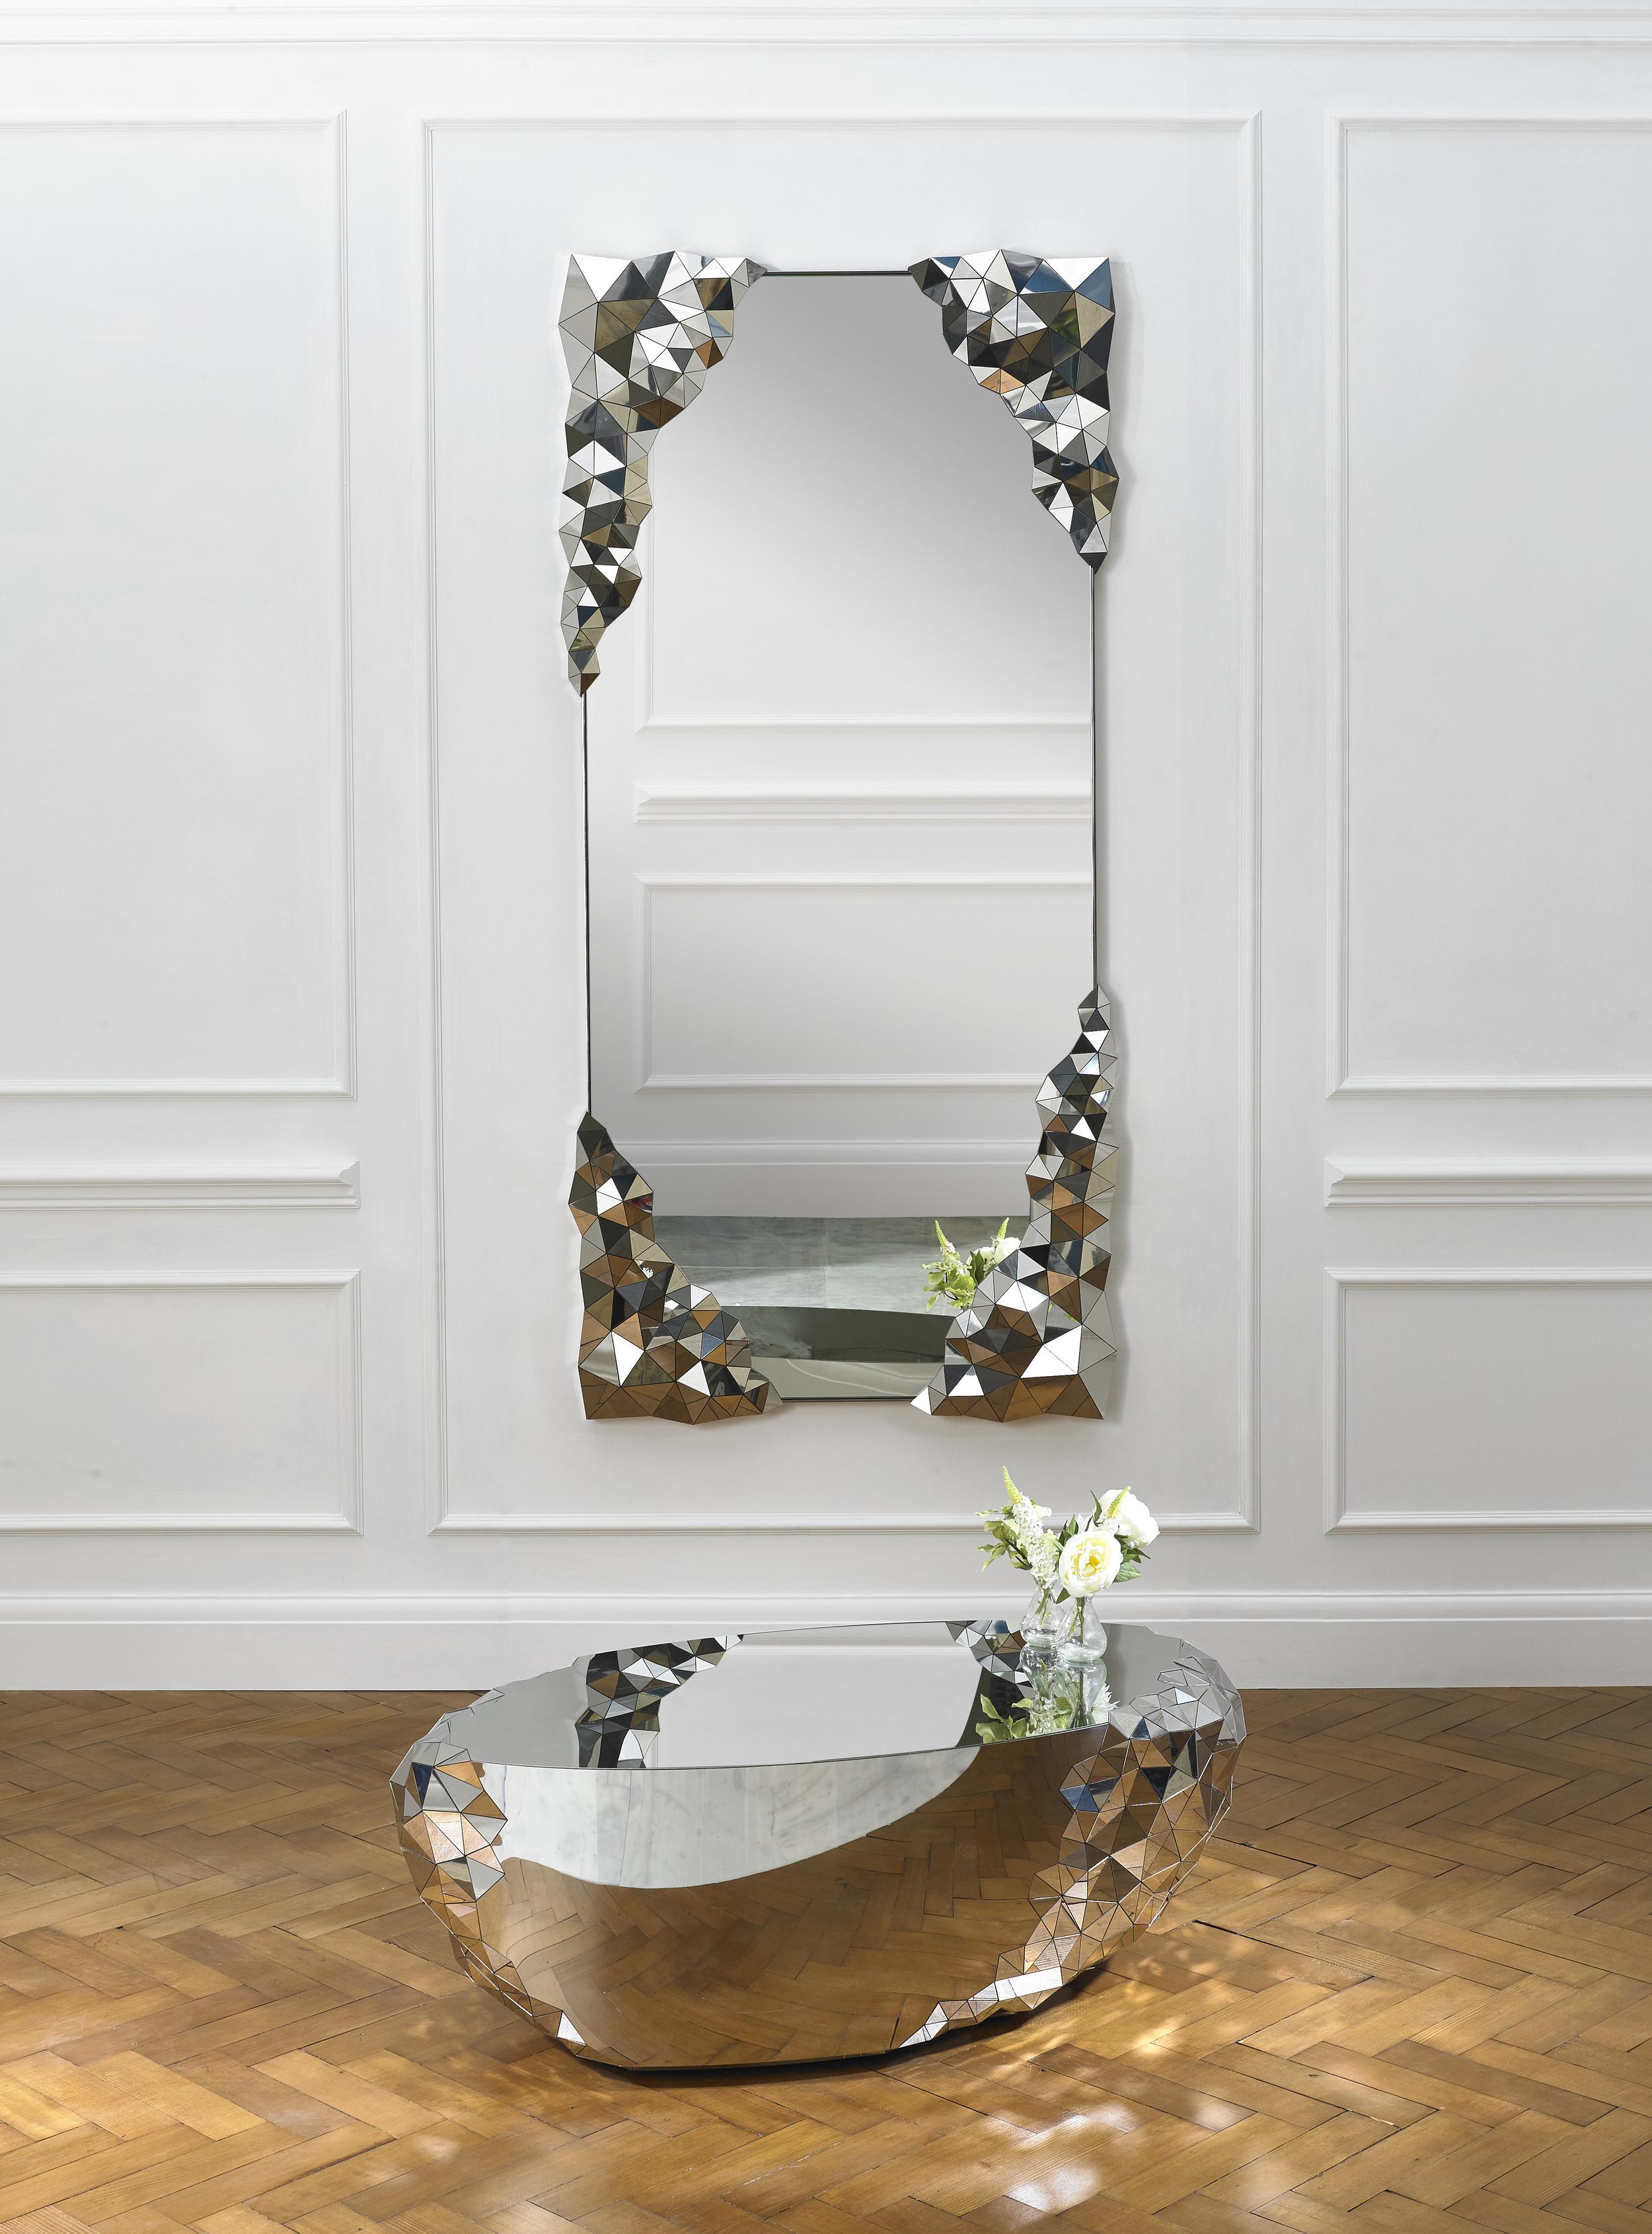 STELLAR Rectangular Mirror by Jake Phipps